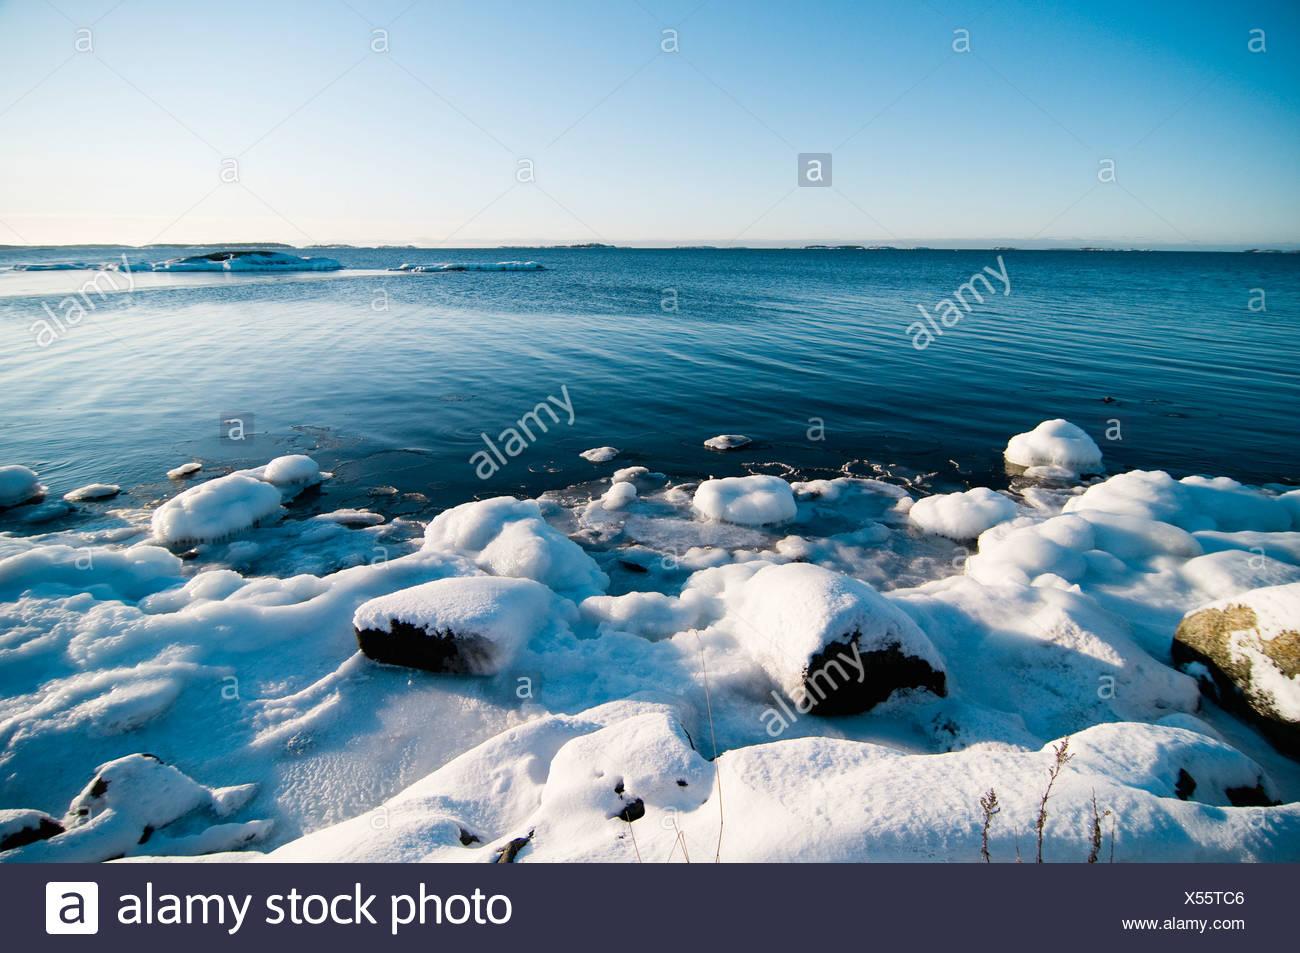 Beautiful view of winter beach - Stock Image